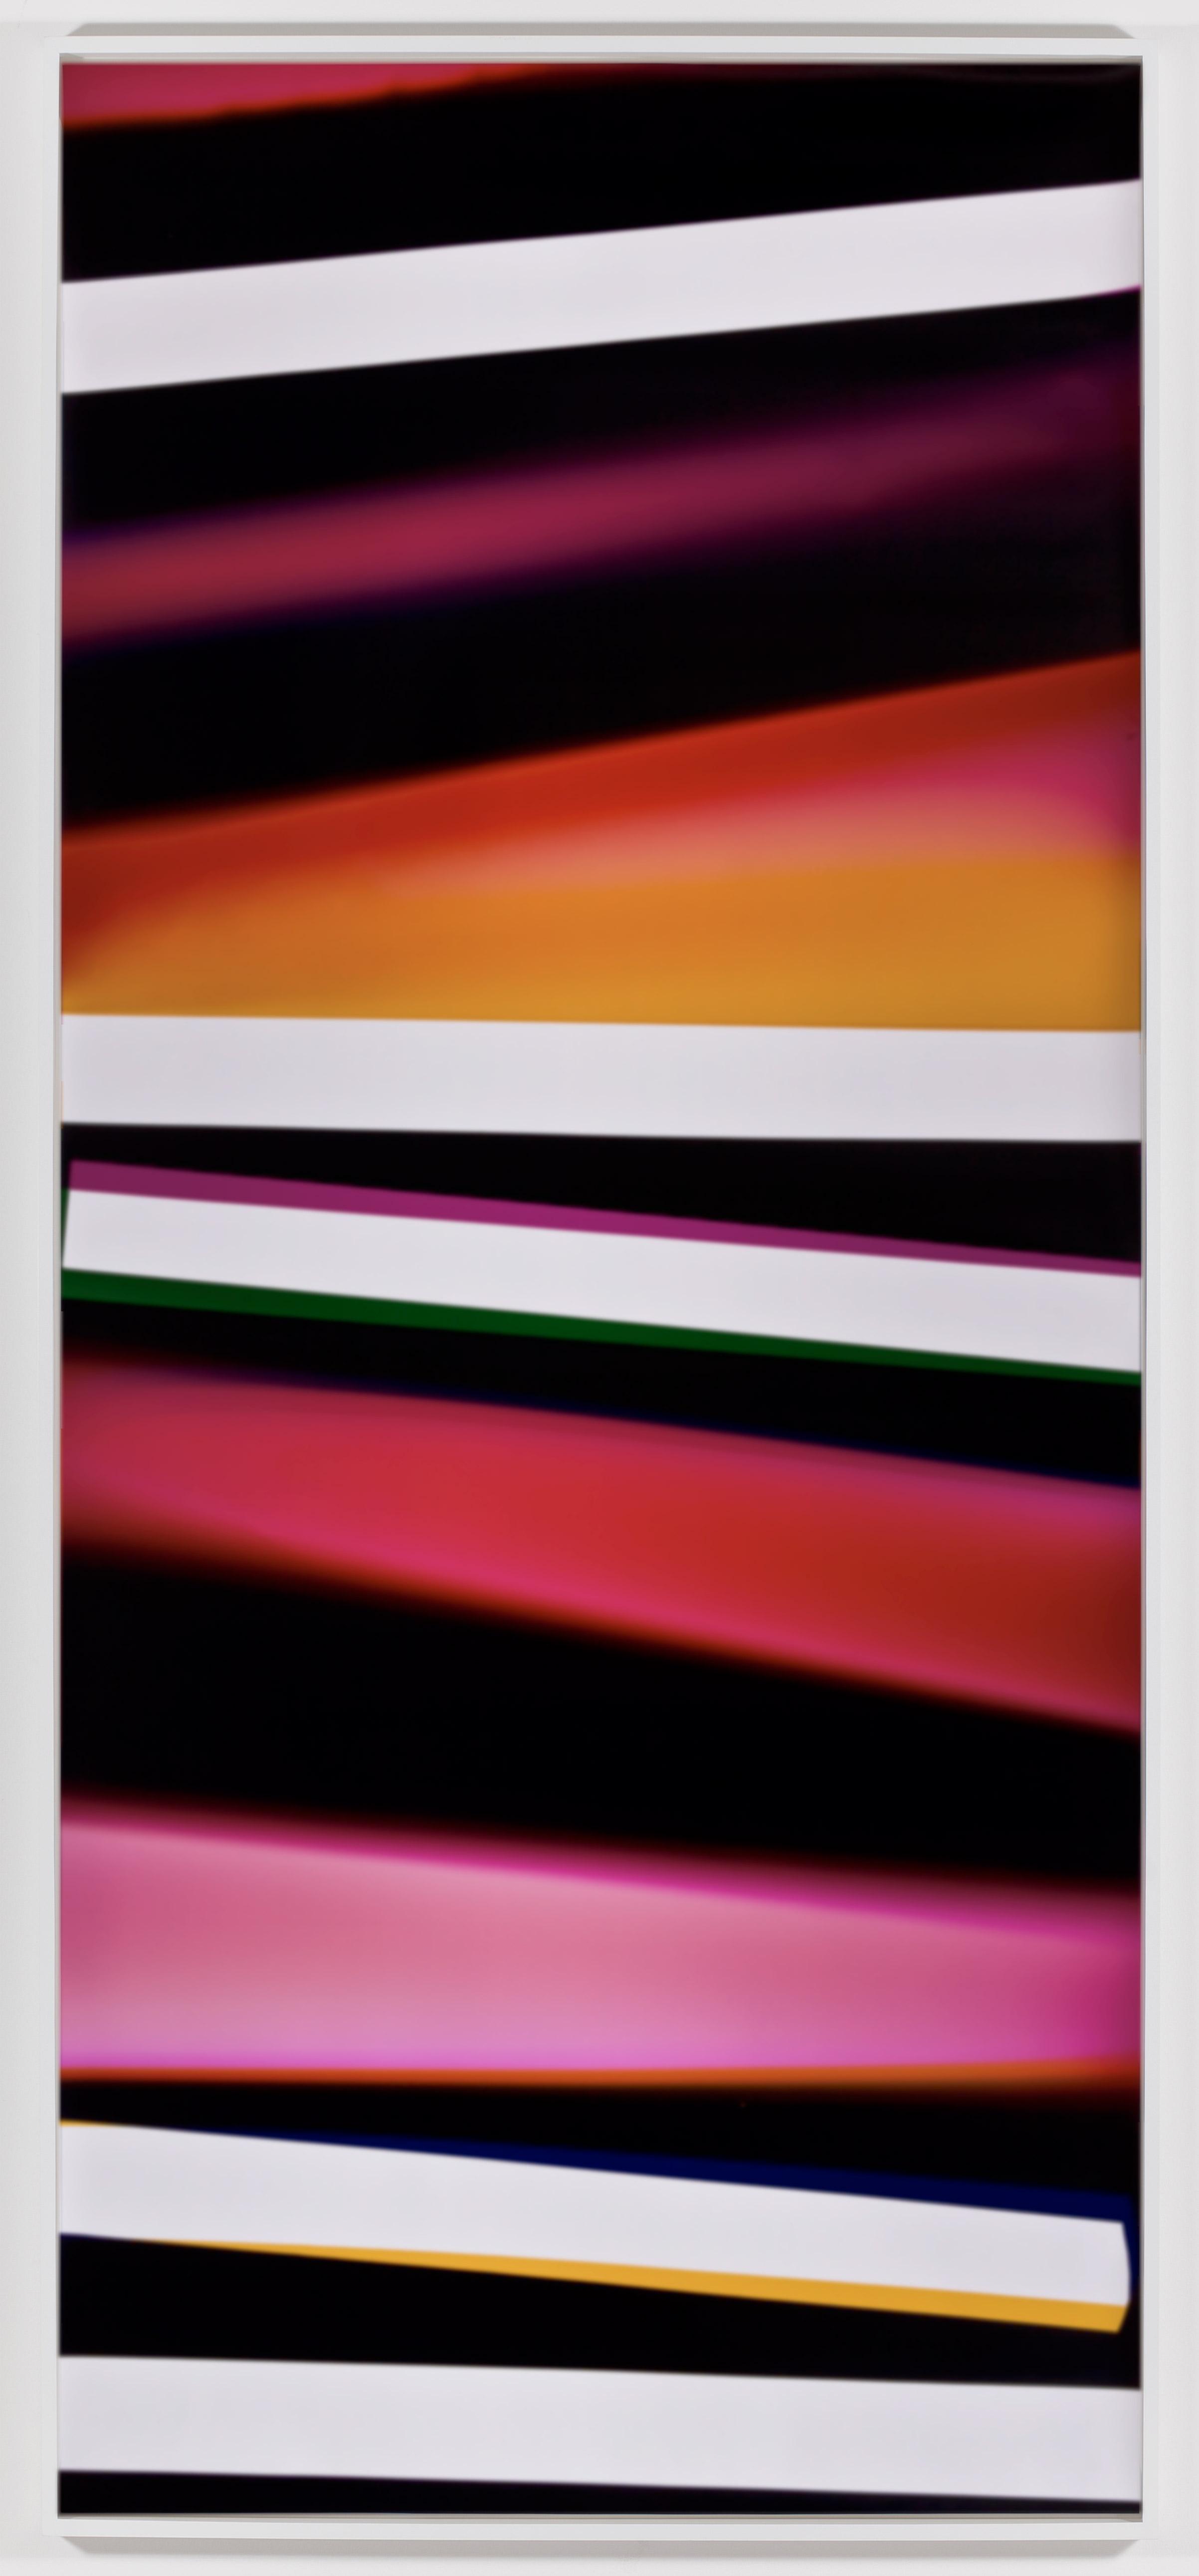 Black Curl (CMY/Five Magnet: Irvine, California, March 26,2010, Fujicolor Crystal Archive Super Type C, Em. No. 165-021, 07510)    2011   Color photographic paper  112 x 50 inches   PROCESSCOLORFIELD, 2011